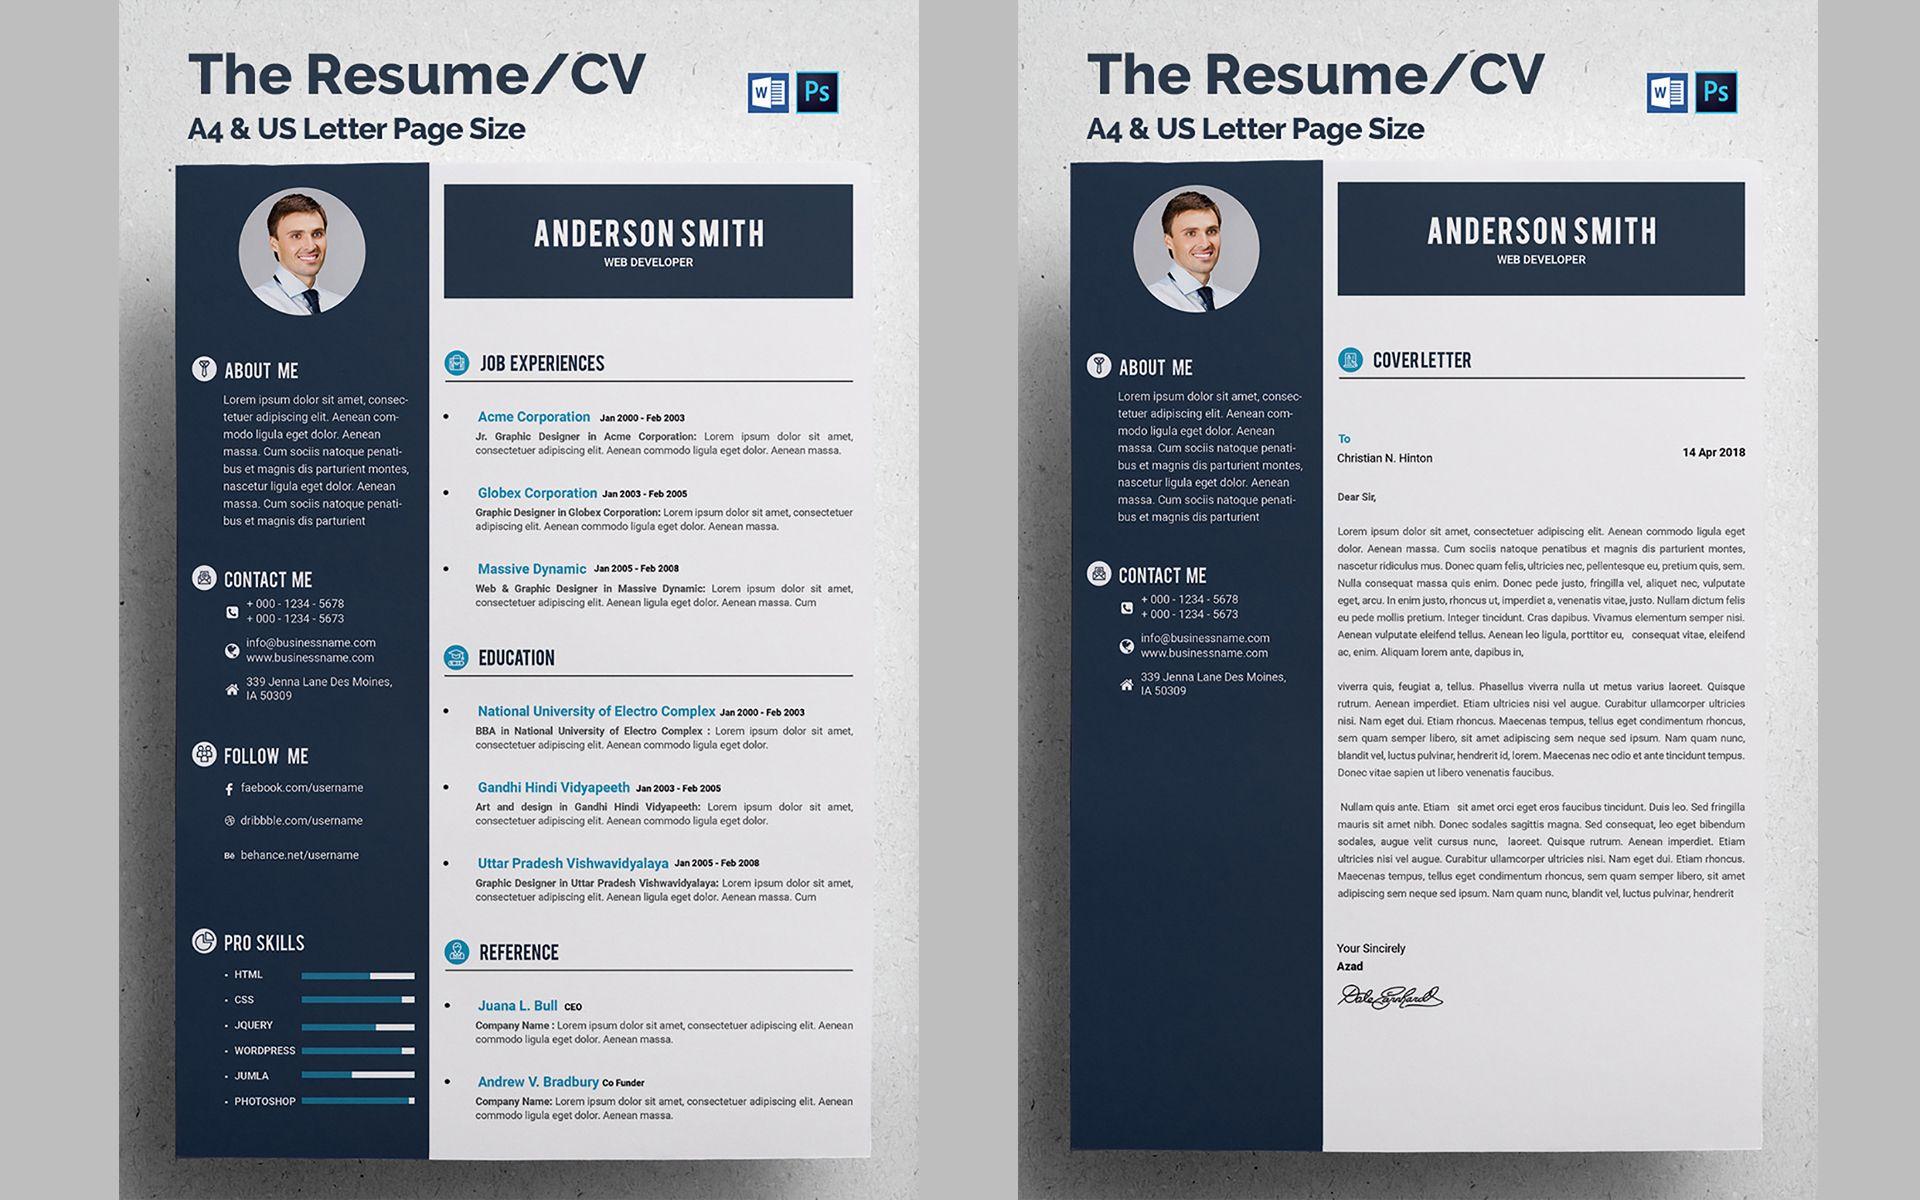 Web Developer Cv Resume Template 68317 Templatemonster Cv Resume Template Resume Template Unique Resume Template